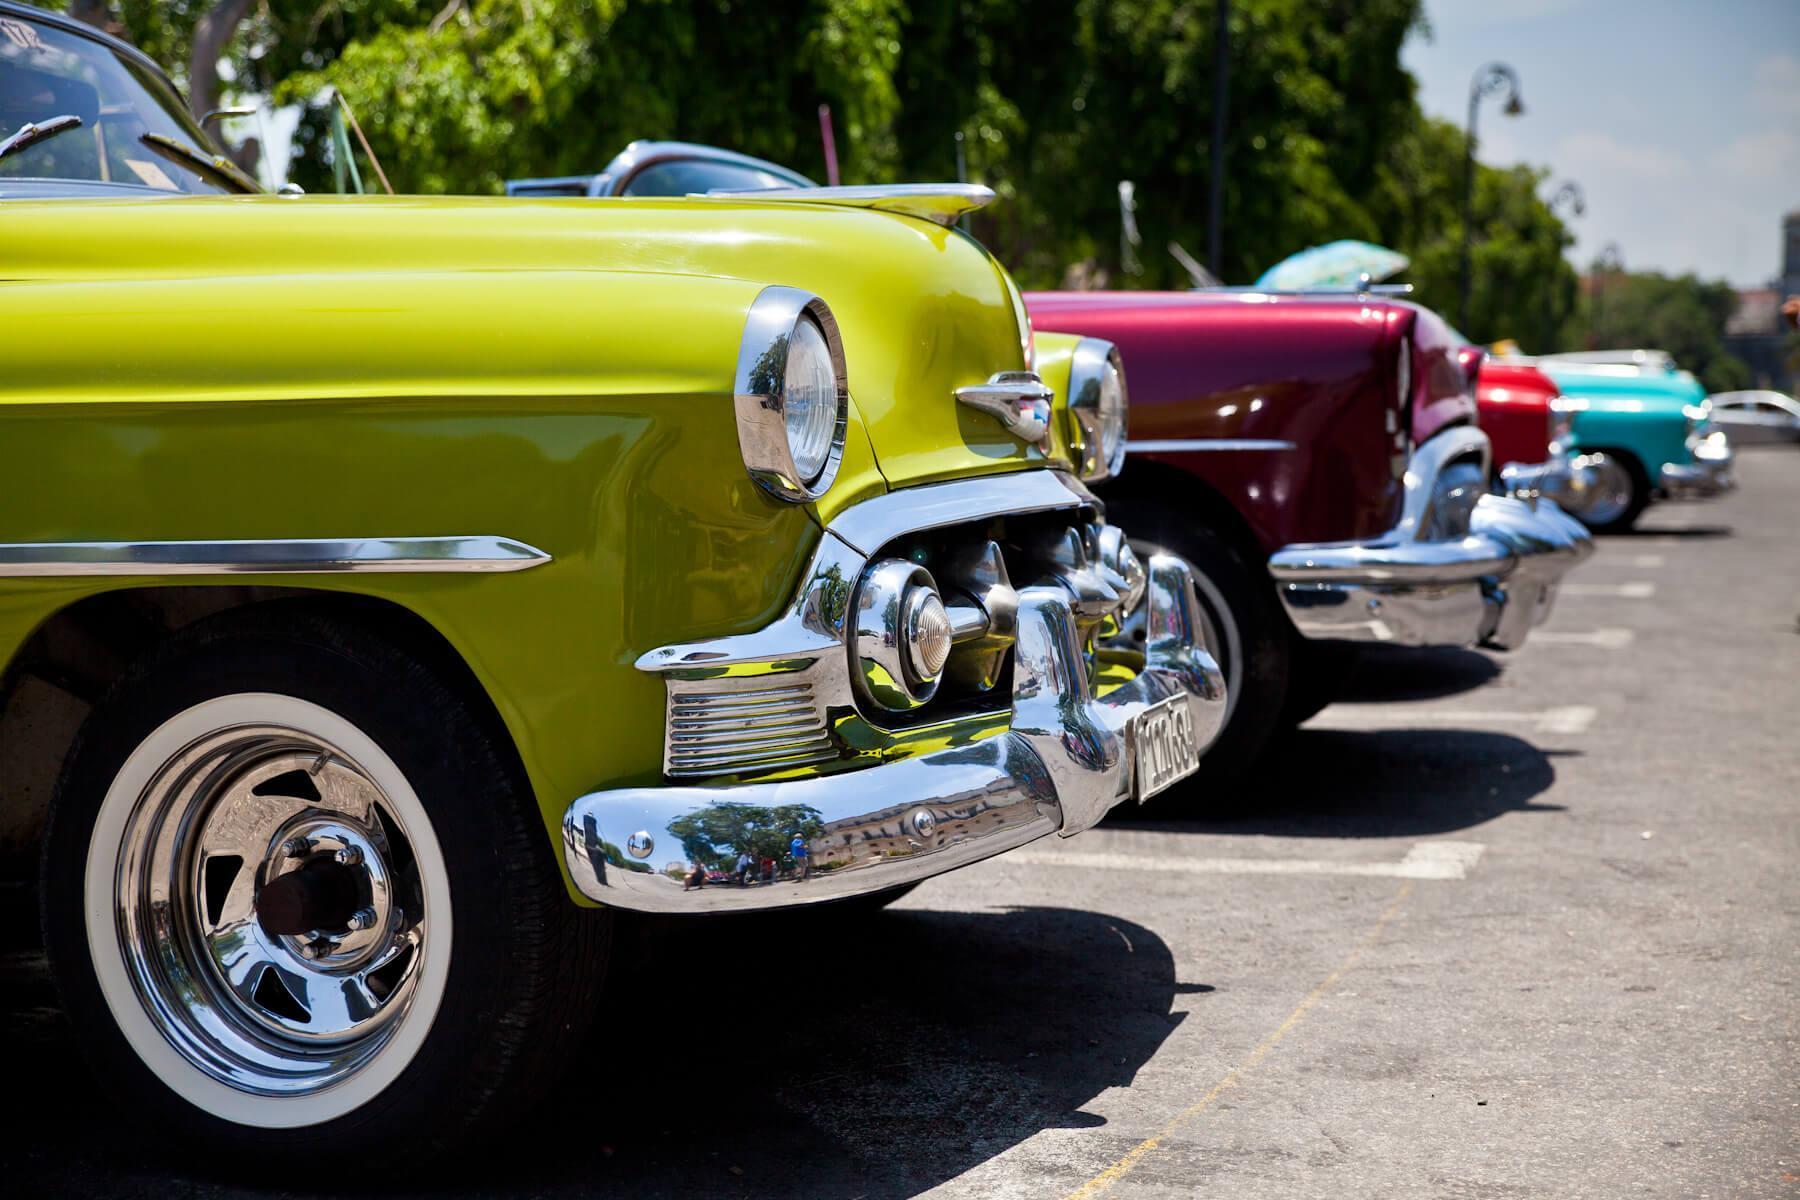 Classic cars line the streets of Havana. © Brian J. Hutchinson